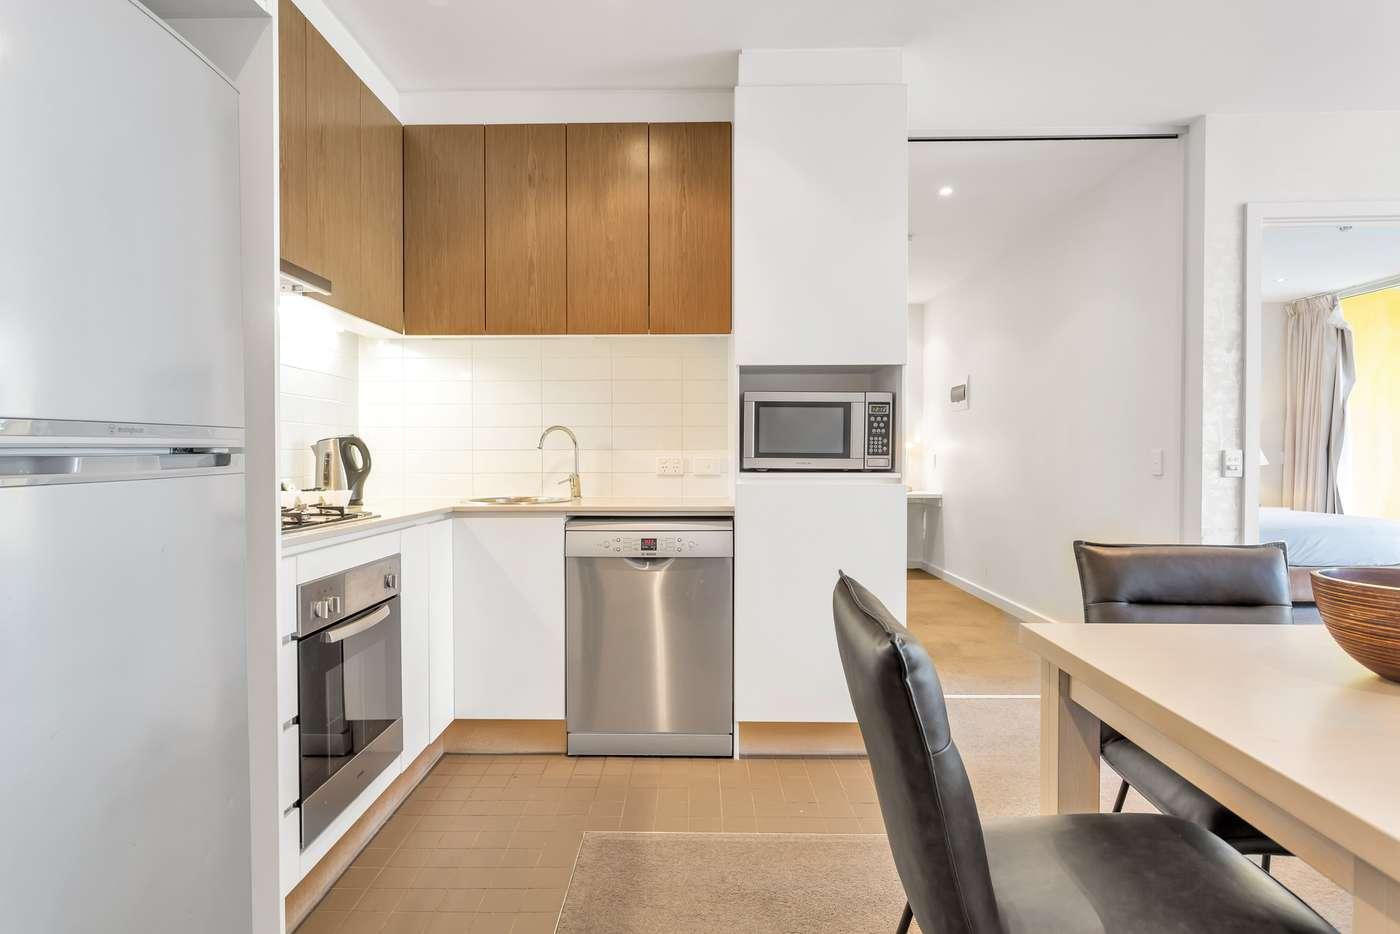 Sixth view of Homely apartment listing, 710/185 Morphett Street, Adelaide SA 5000